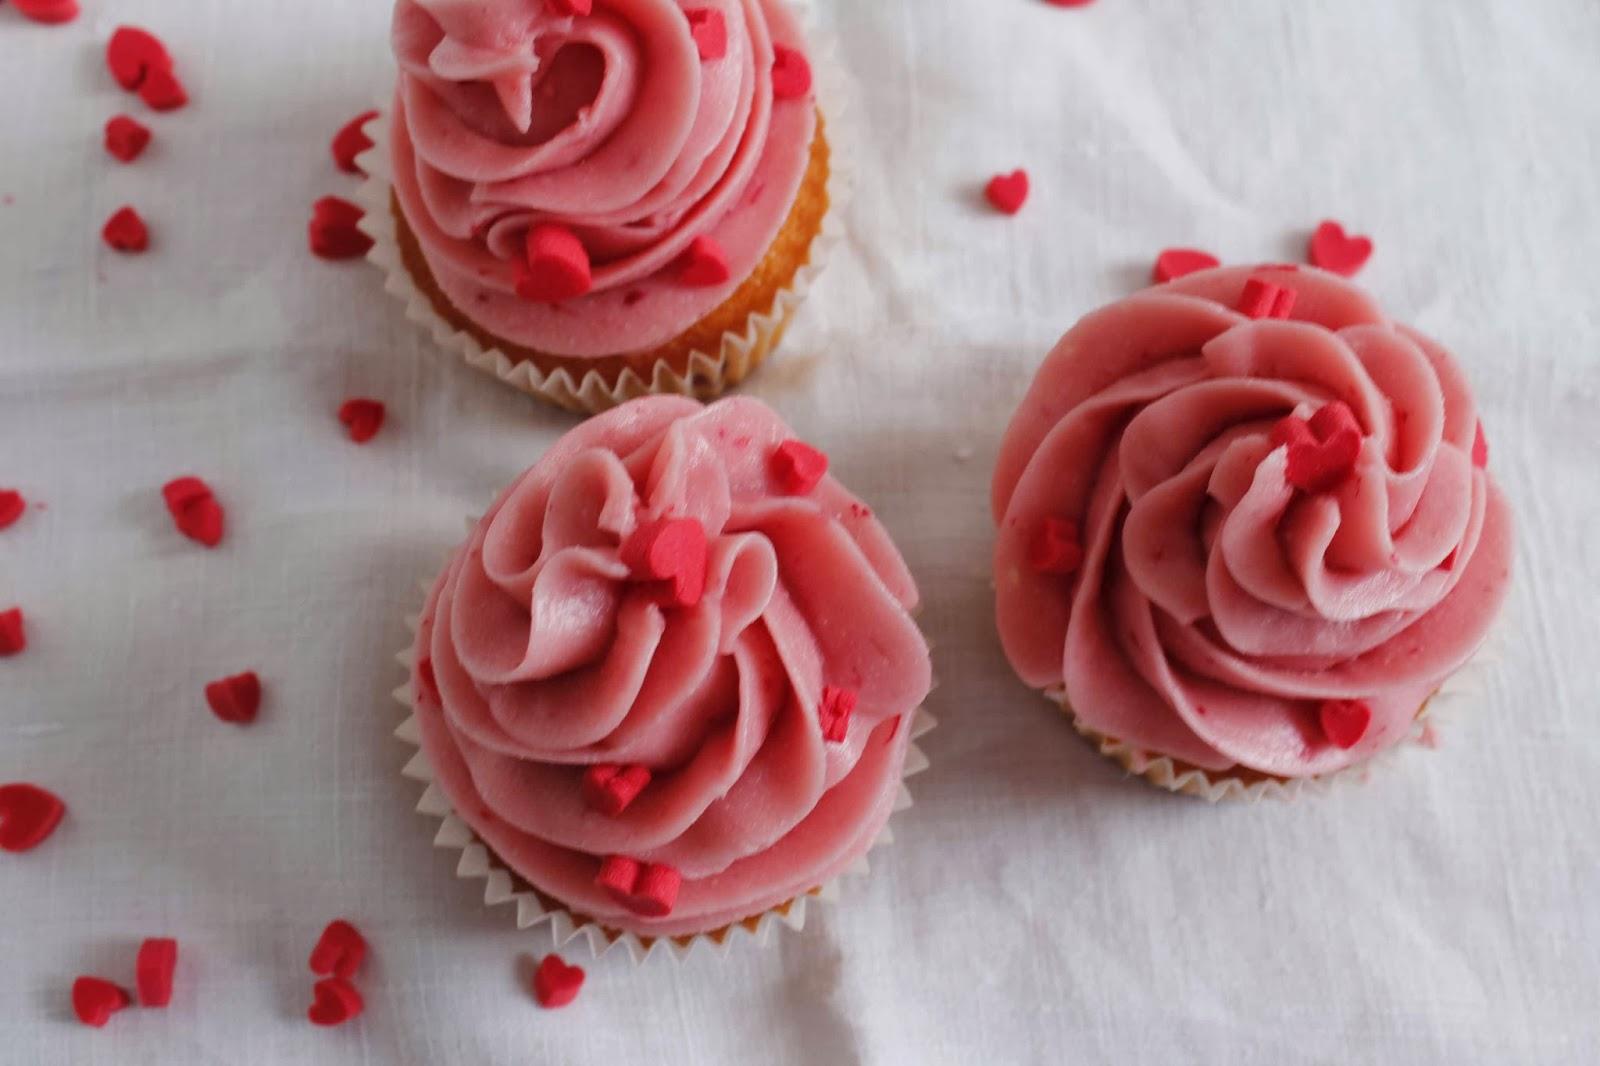 Receta Cupcakes de almendra y buttercream de merengue suizo de frambuesa